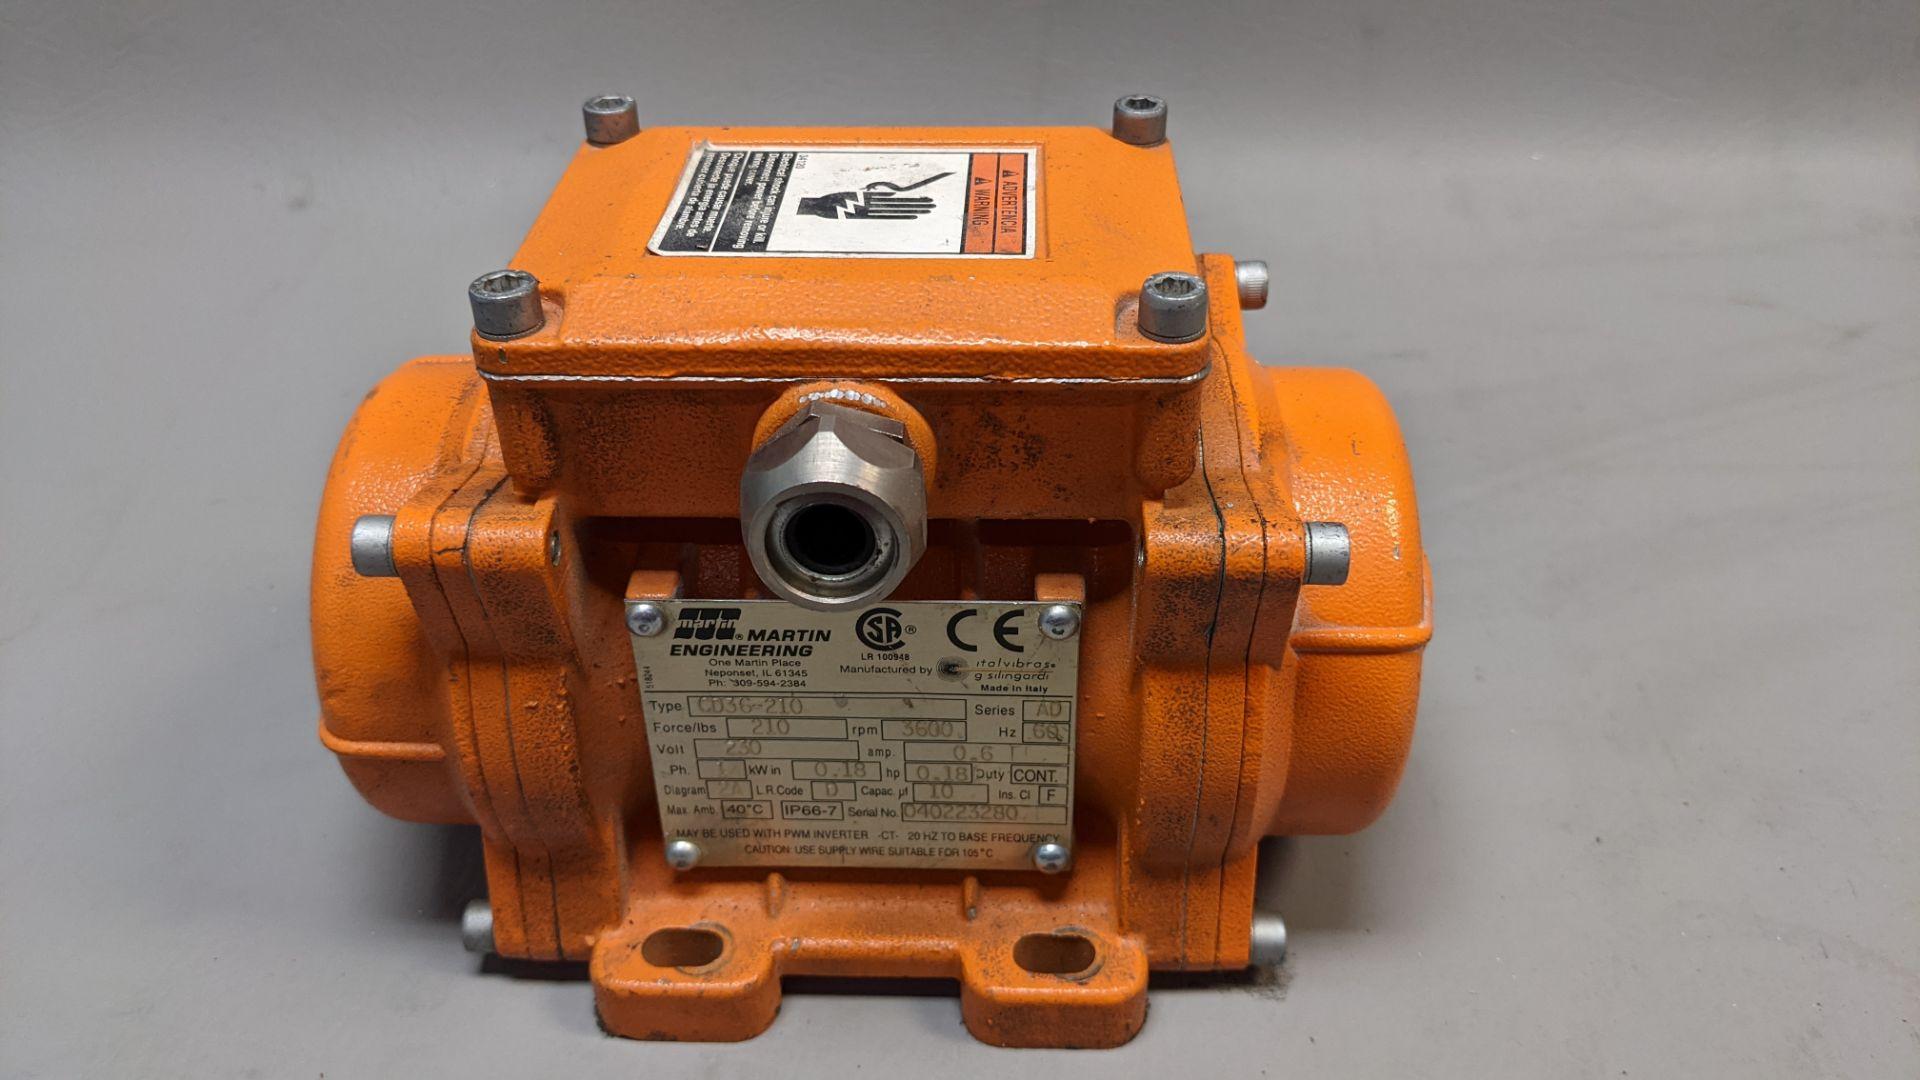 MARTIN ENGINEERING INDUSTRIAL VIBRATOR